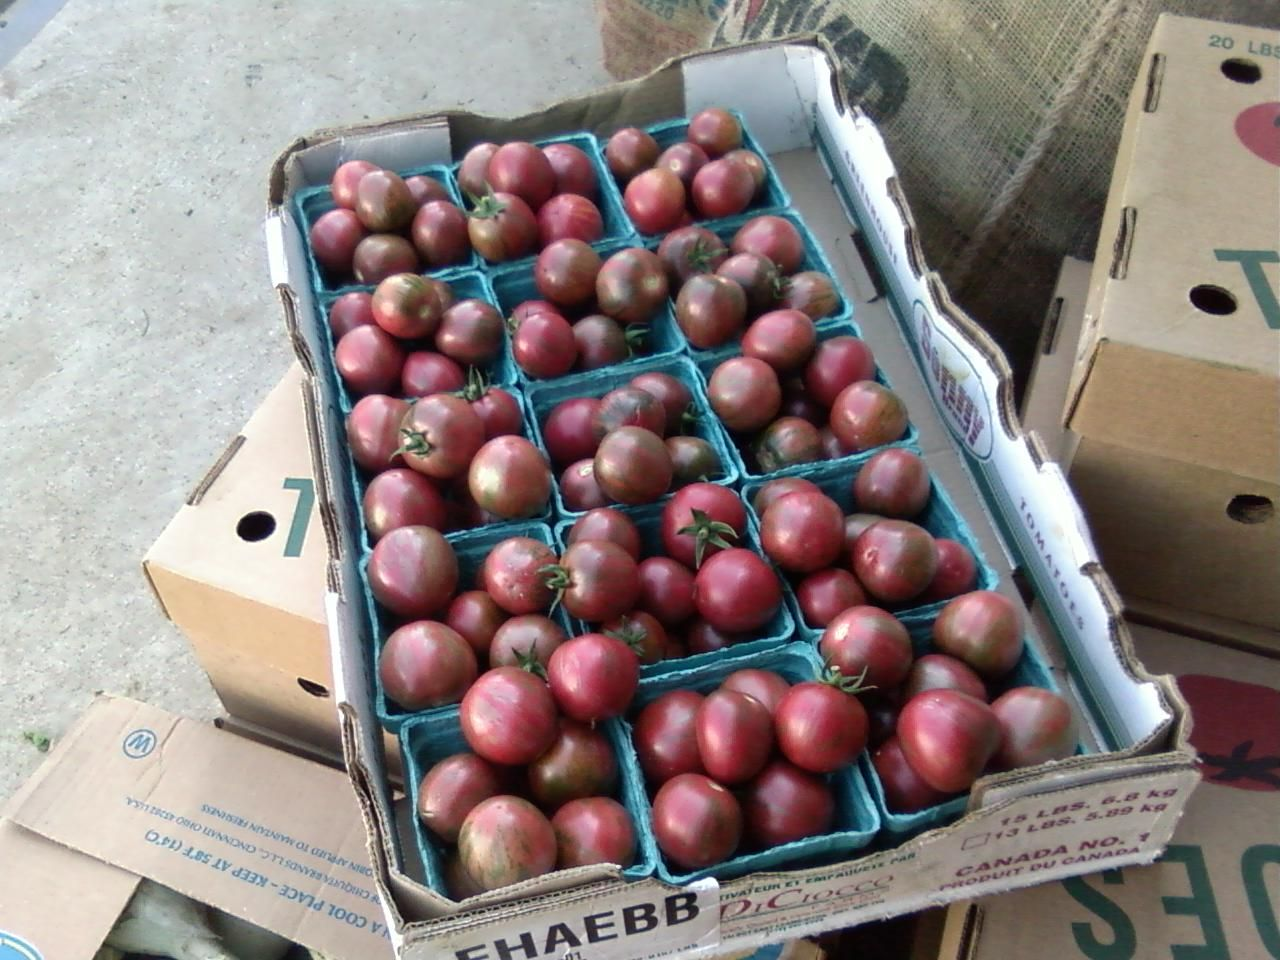 Heirloom Tomatoes from Foppema's Farm.  Northbridge, MA.